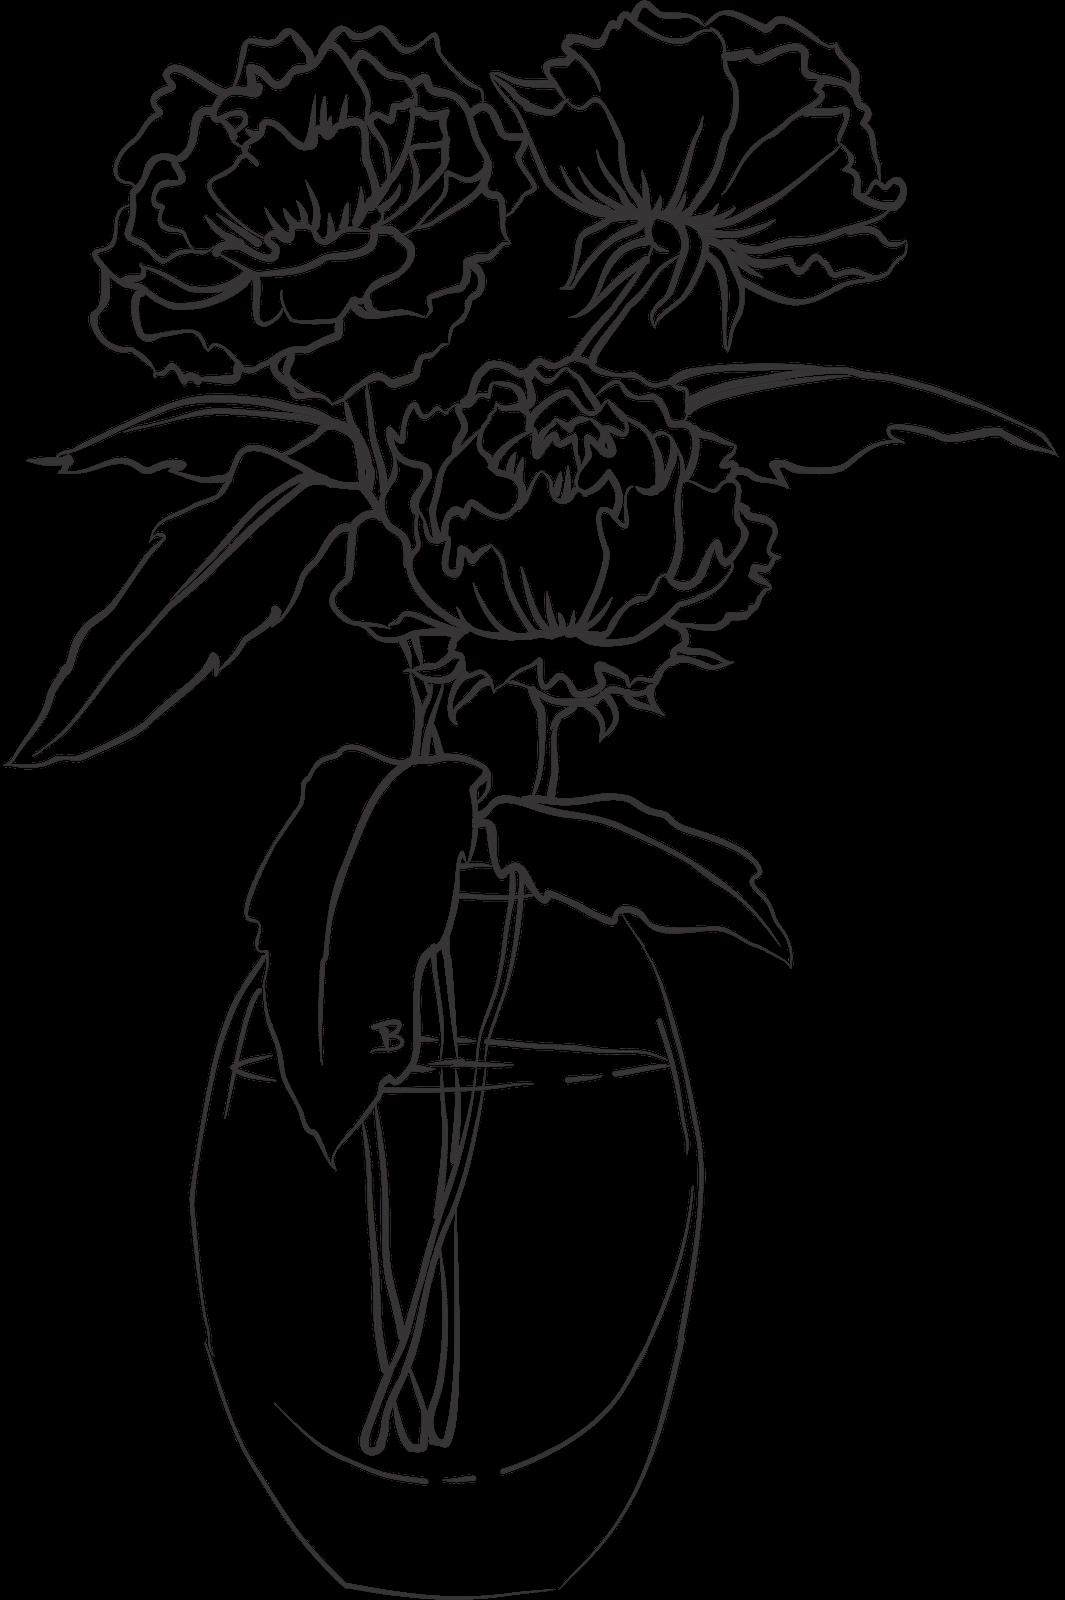 Drawn vase full flower  : Close Coloring I'm